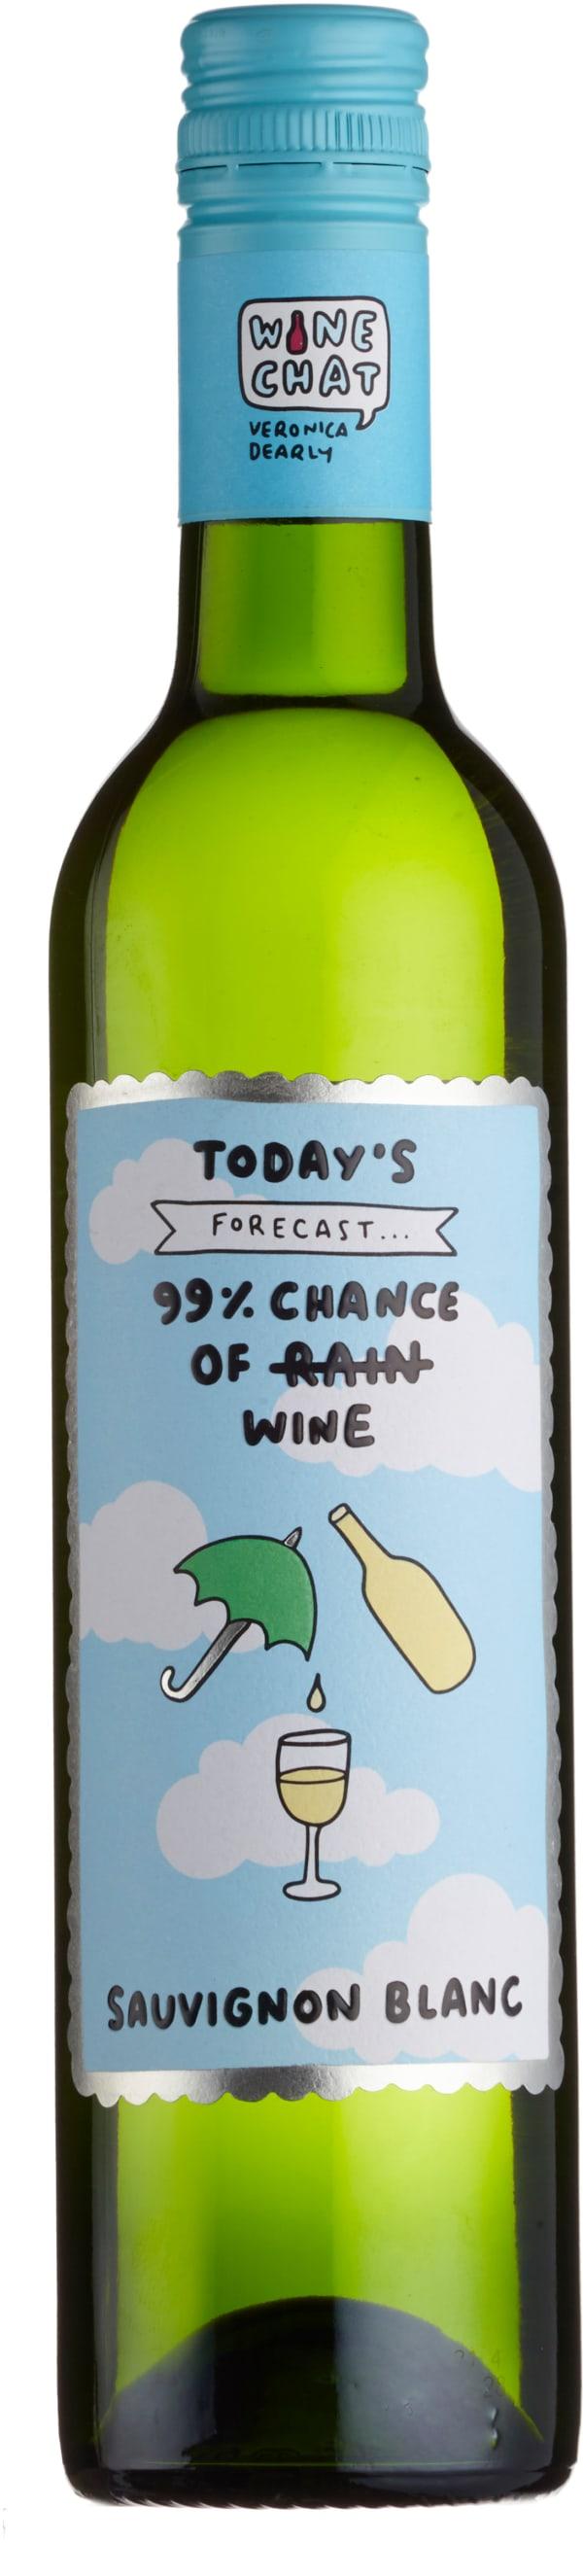 Wine Chat 99% Chance of Wine Sauvignon Blanc 2018